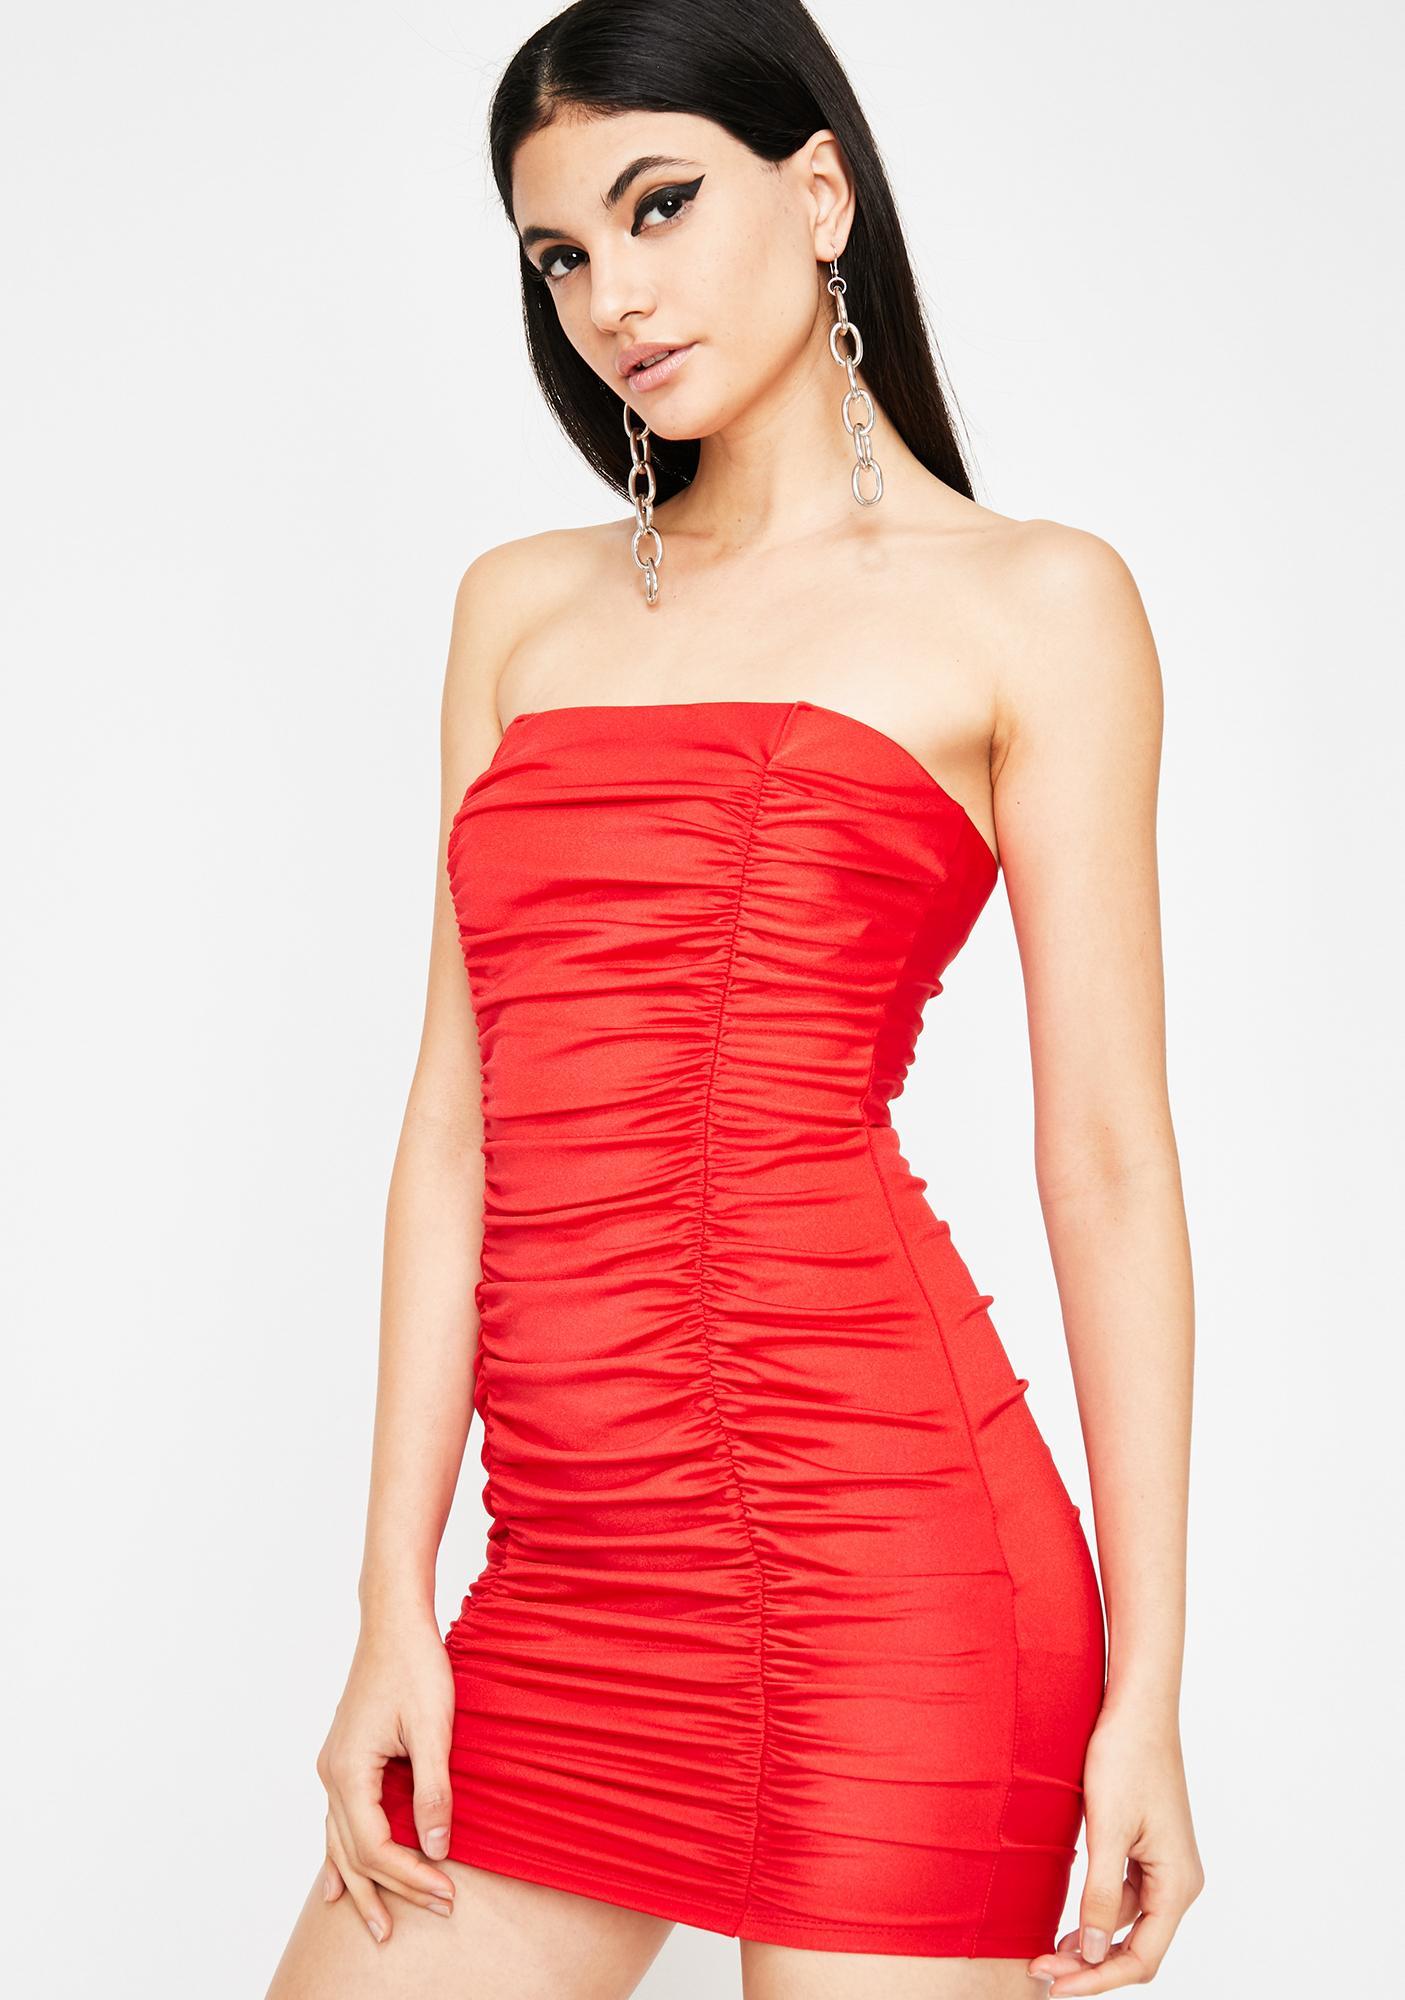 Hott Viral Wifey Ruche Dress